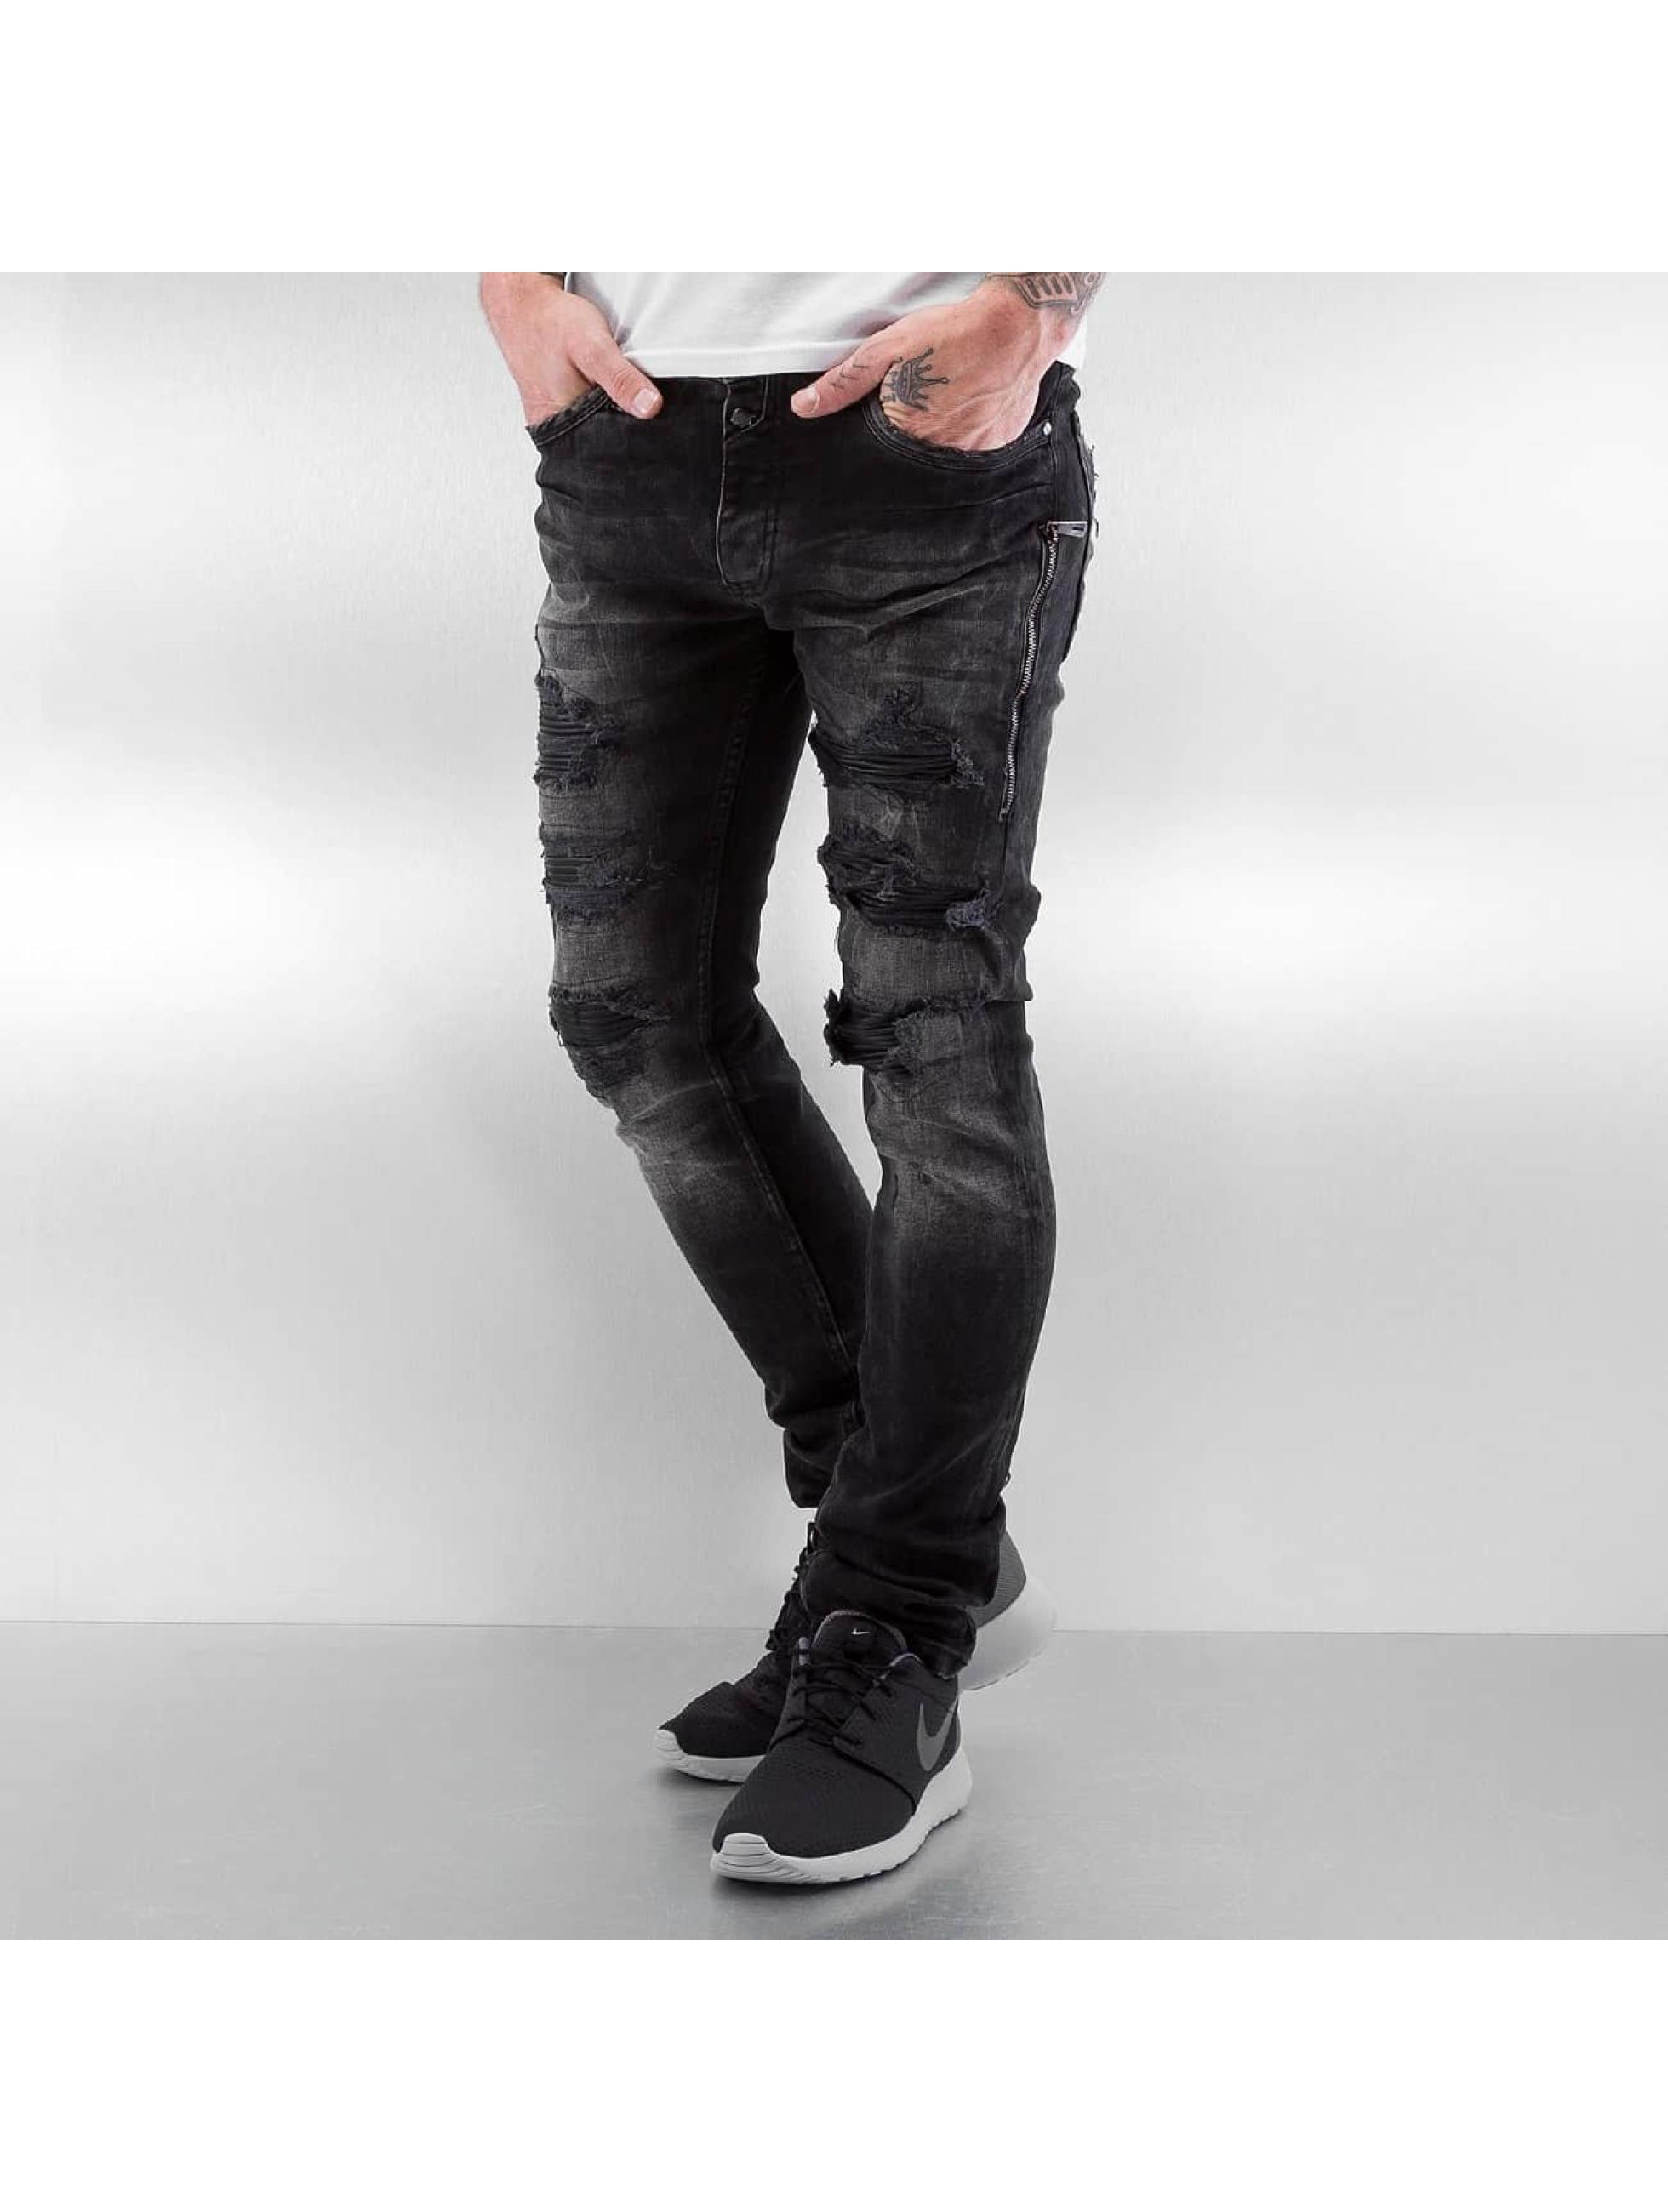 Skinny Jeans Ripped Leather Biker in blau